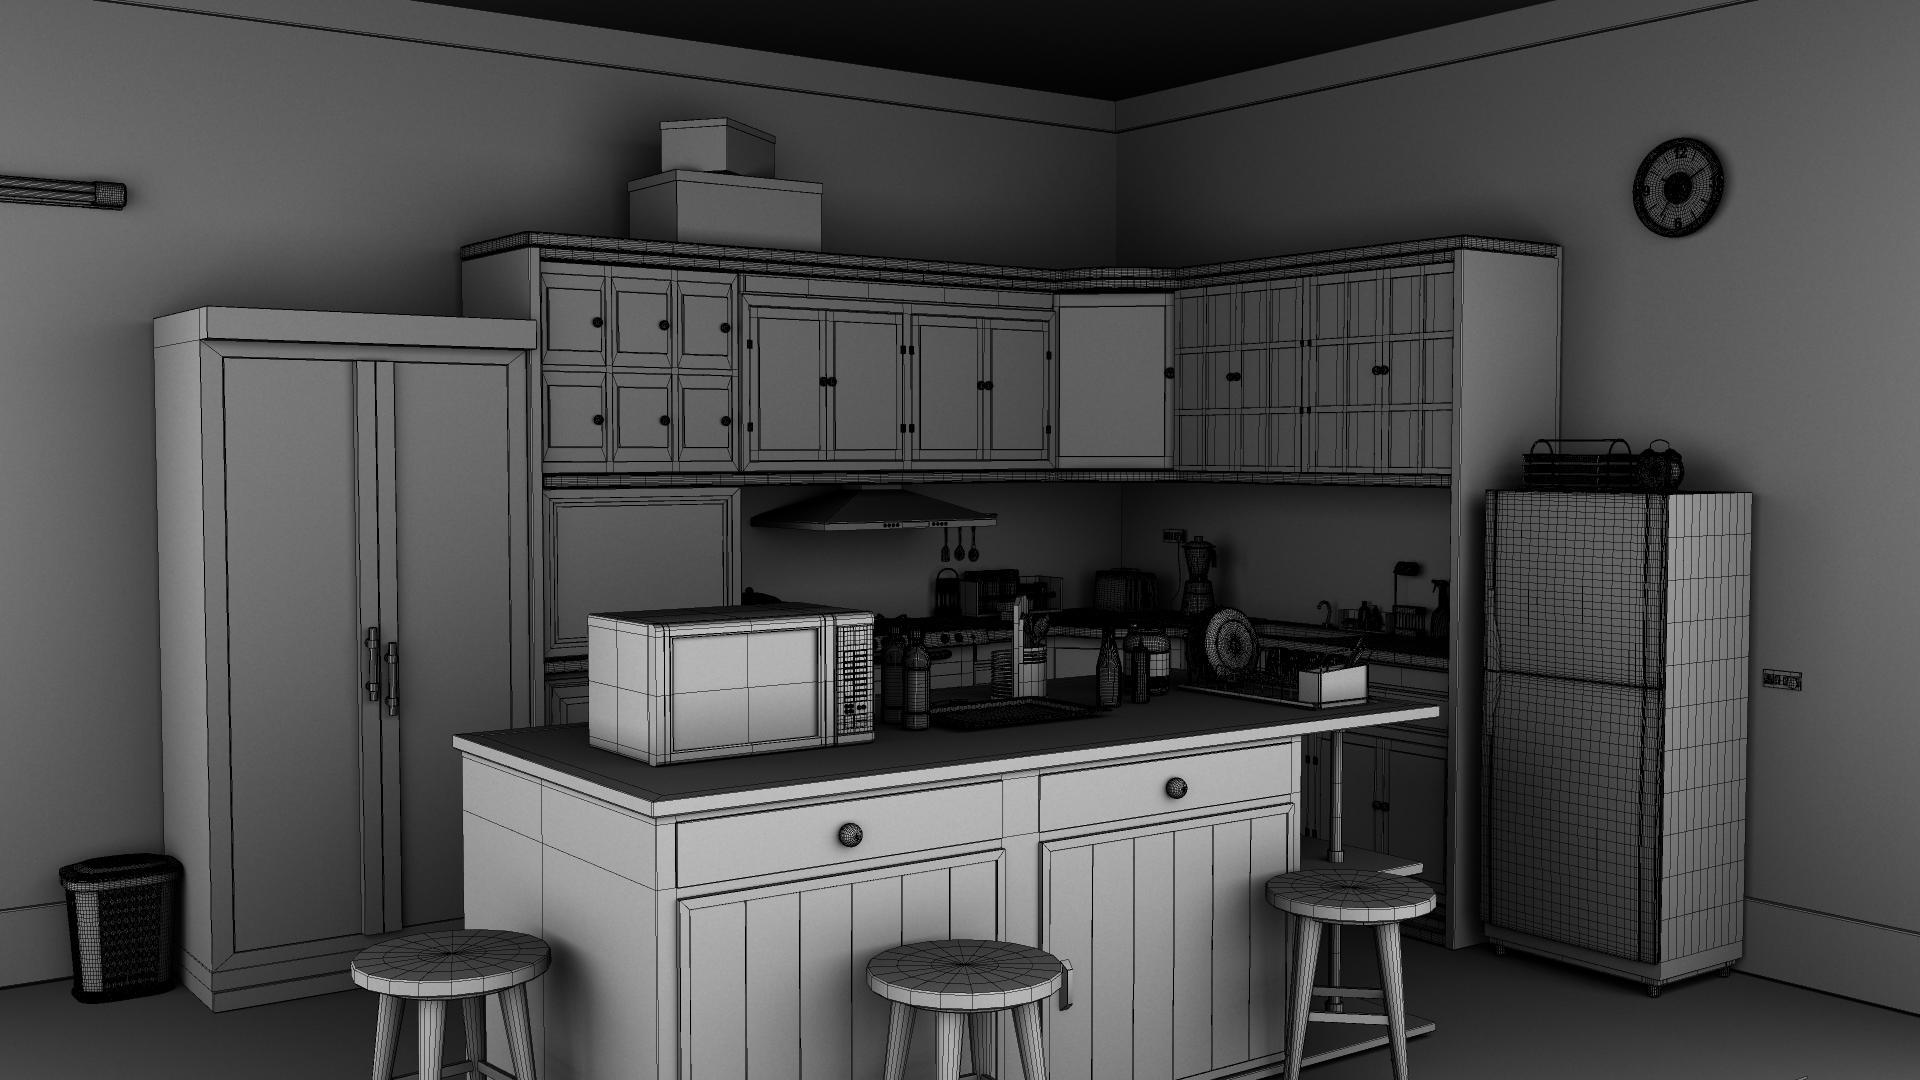 Kitchen 3D Model | FlatPyramid on Model Kitchen Picture  id=45008